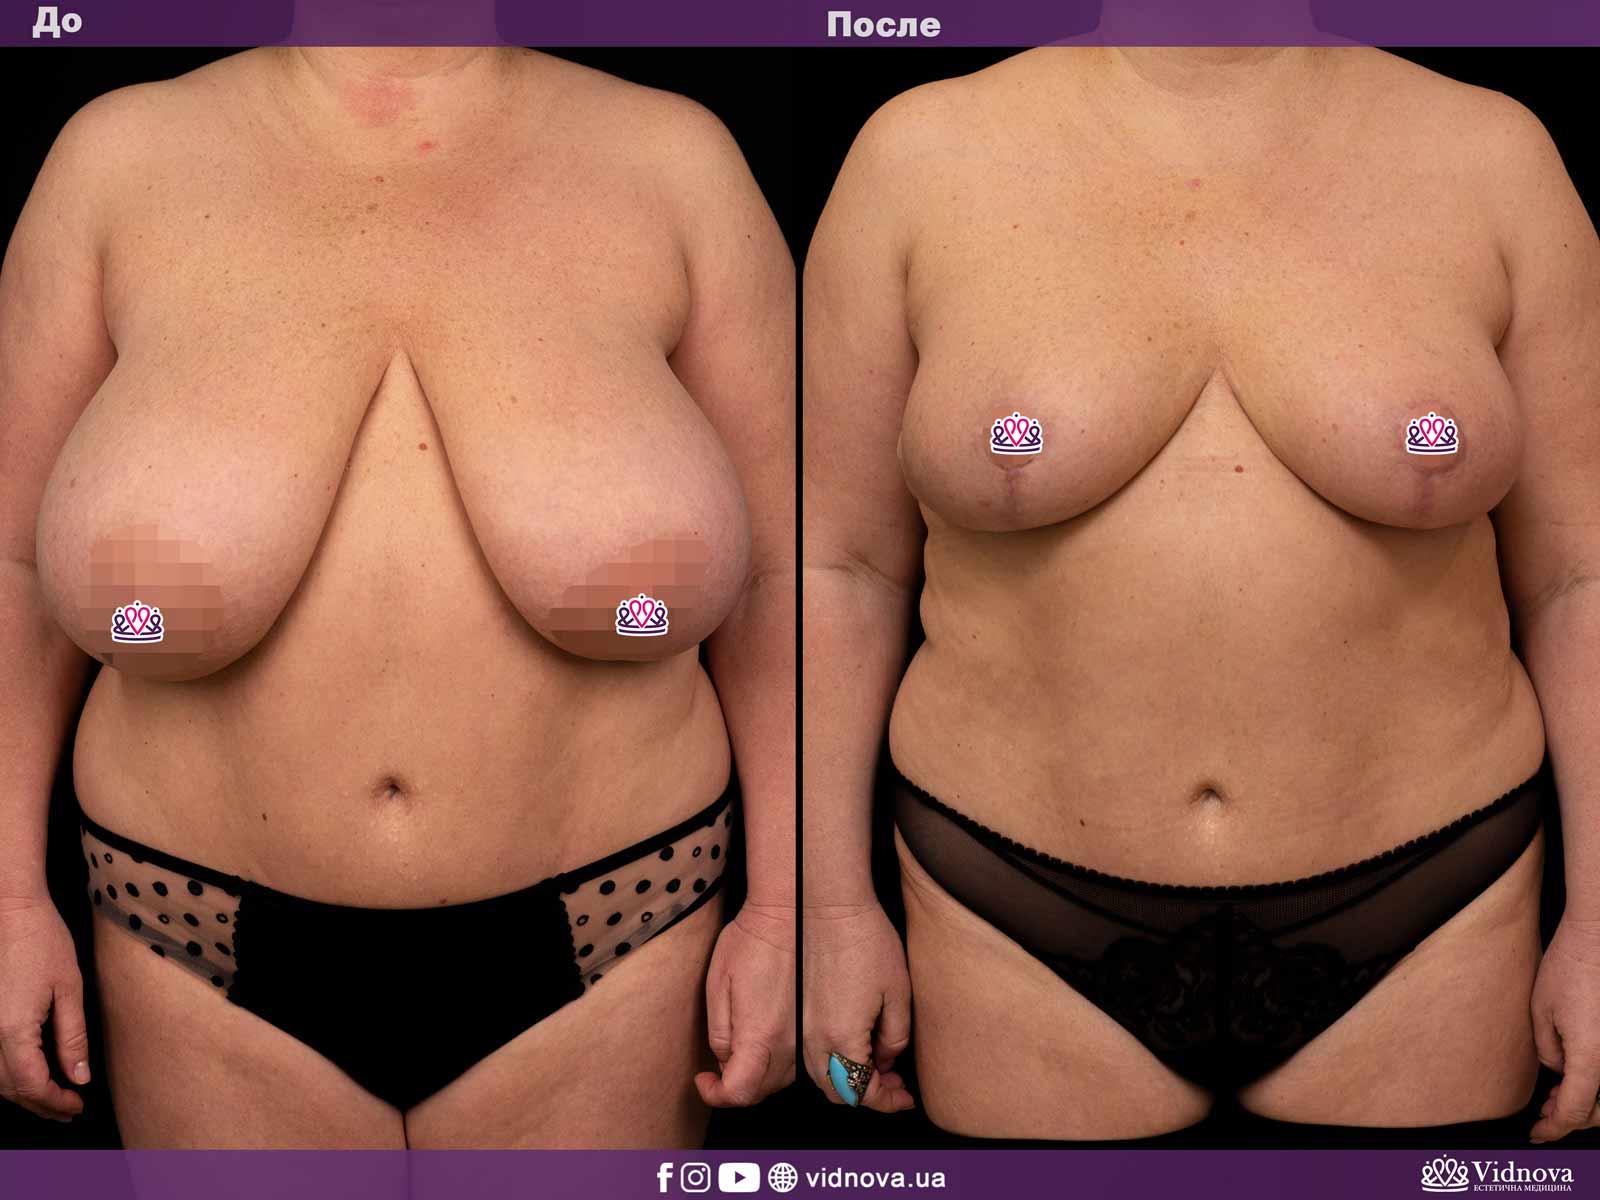 Уменьшение груди: Фото ДО и ПОСЛЕ - Пример №2-1 - Клиника Vidnova